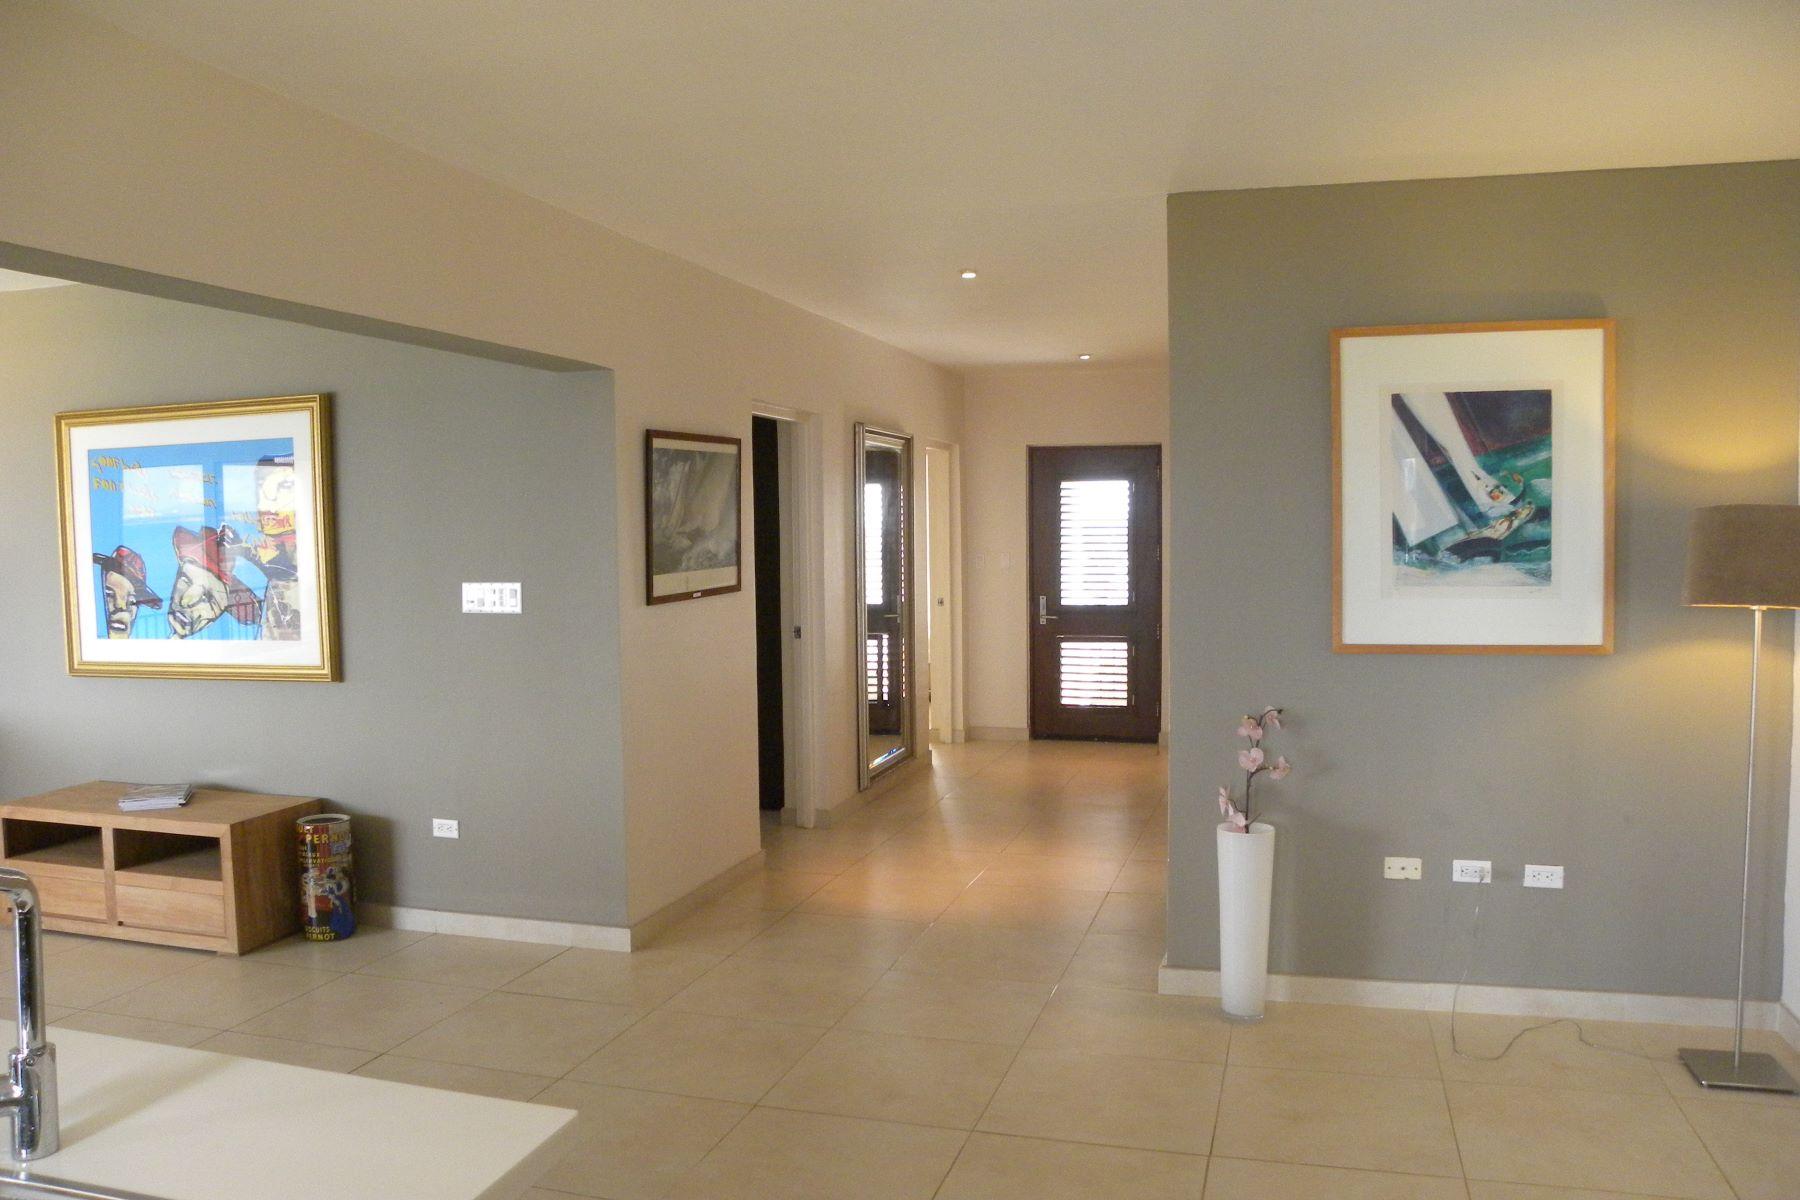 Additional photo for property listing at Hausman Follies 13 克拉伦代, 博内尔岛 博内尔